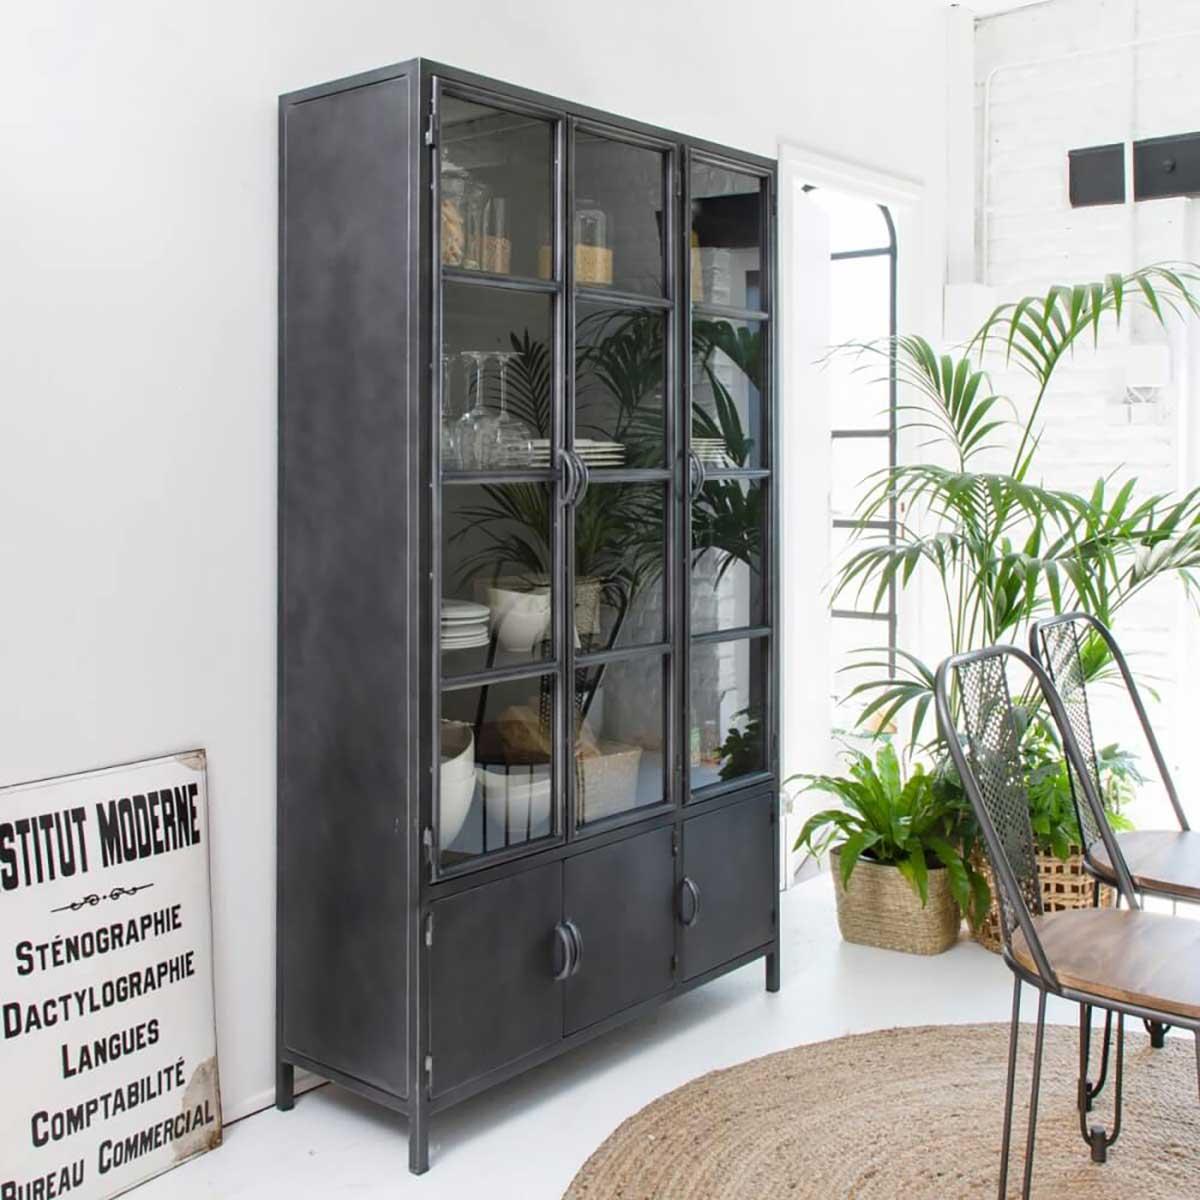 Vaisselier industriel : 18 meubles style vitrine en métal